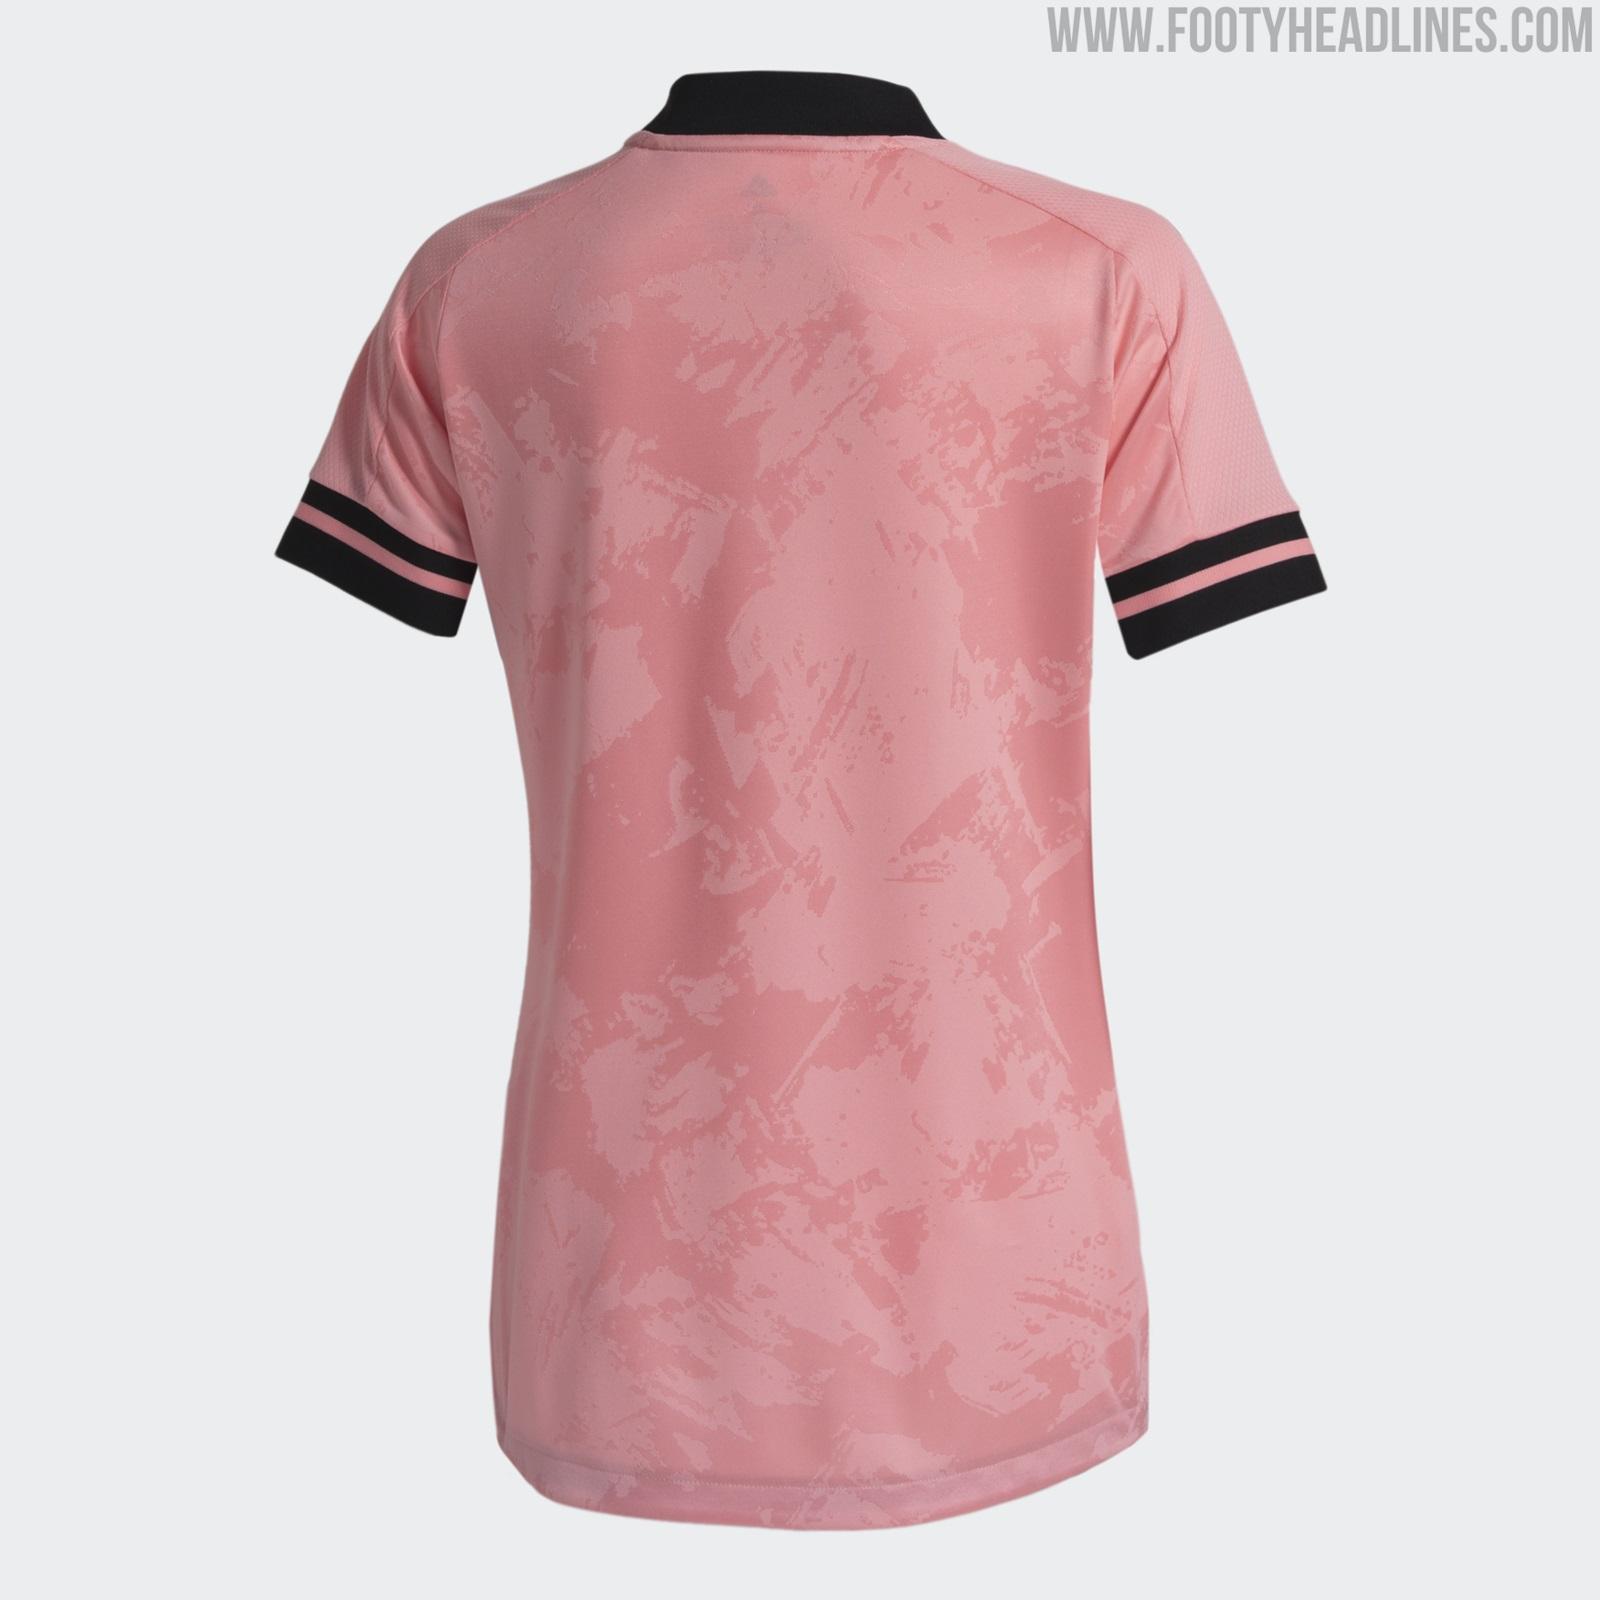 Rosa Adidas Flamengo, Internacional & Sao Paulo 2020 ...